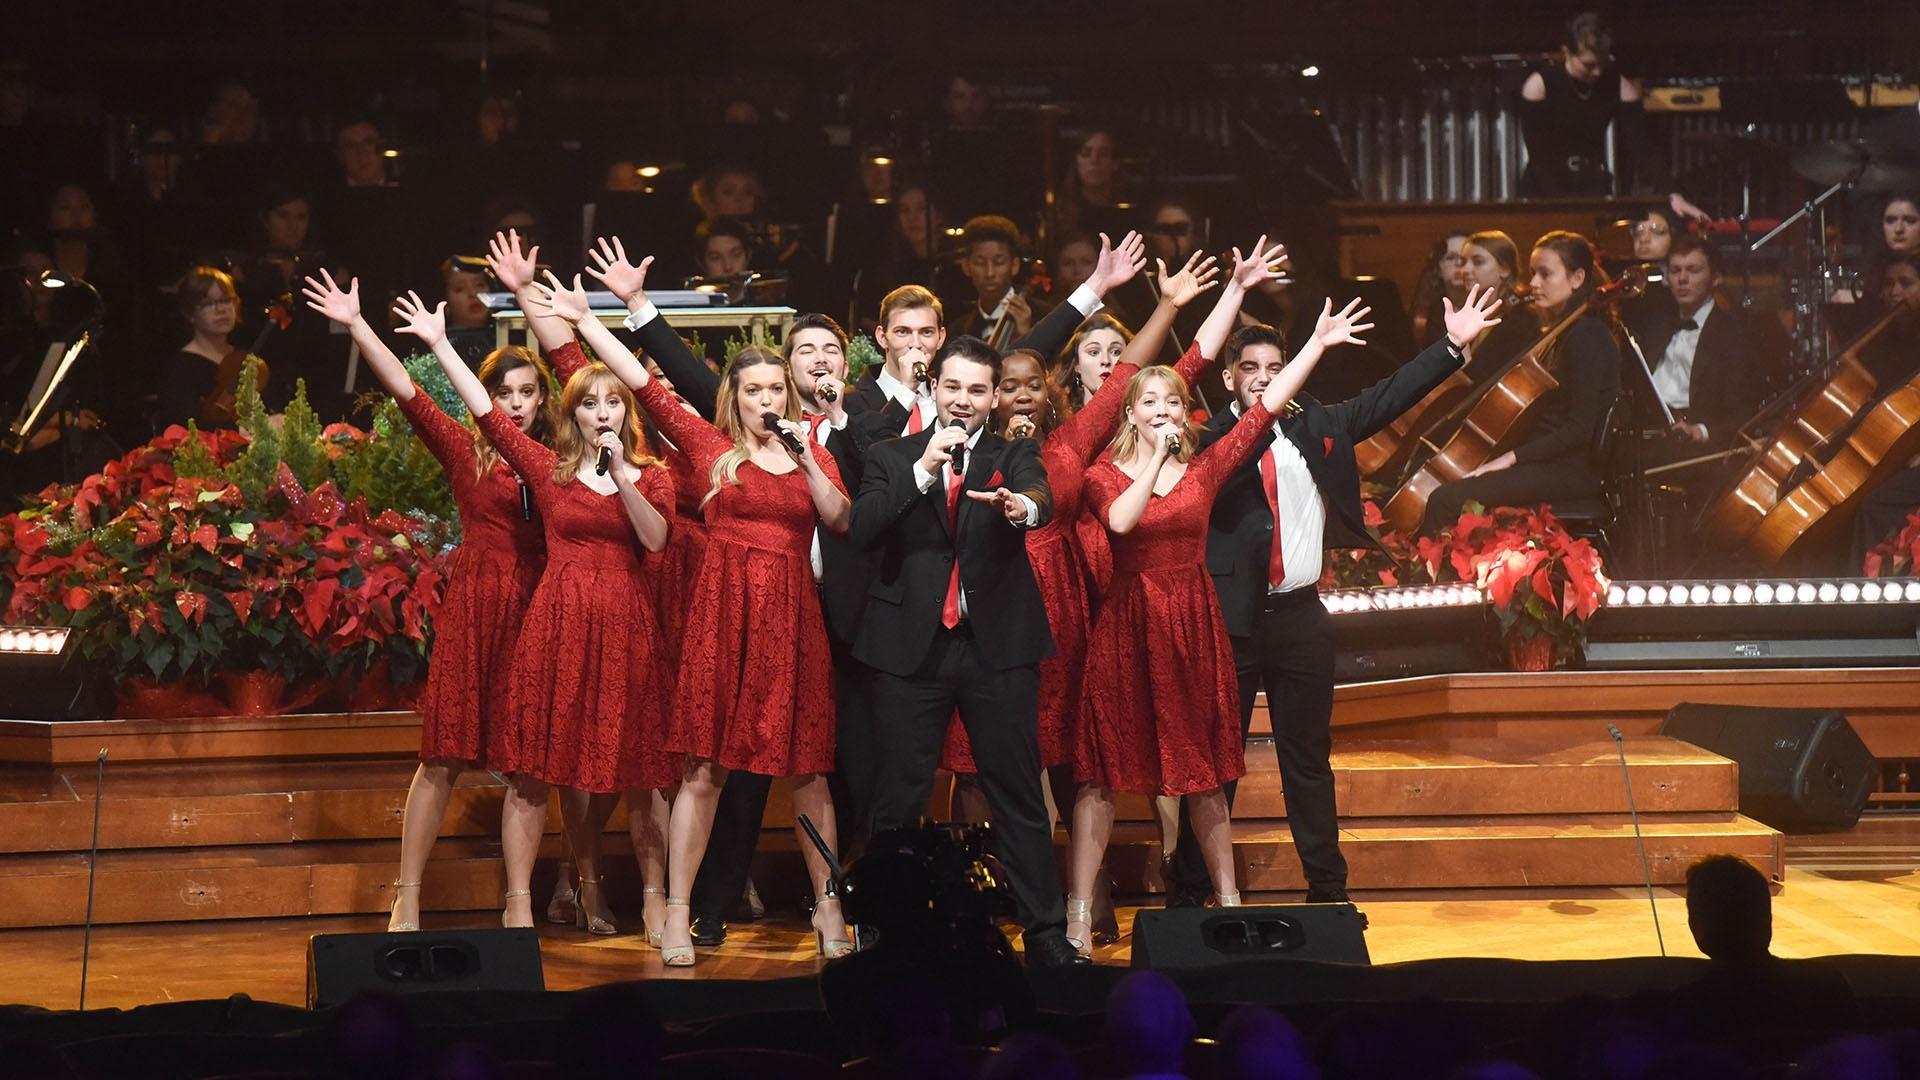 Christmas At Belmont 2020 Pbs Christmas at Belmont | Christmas at Belmont 2019 | Preview